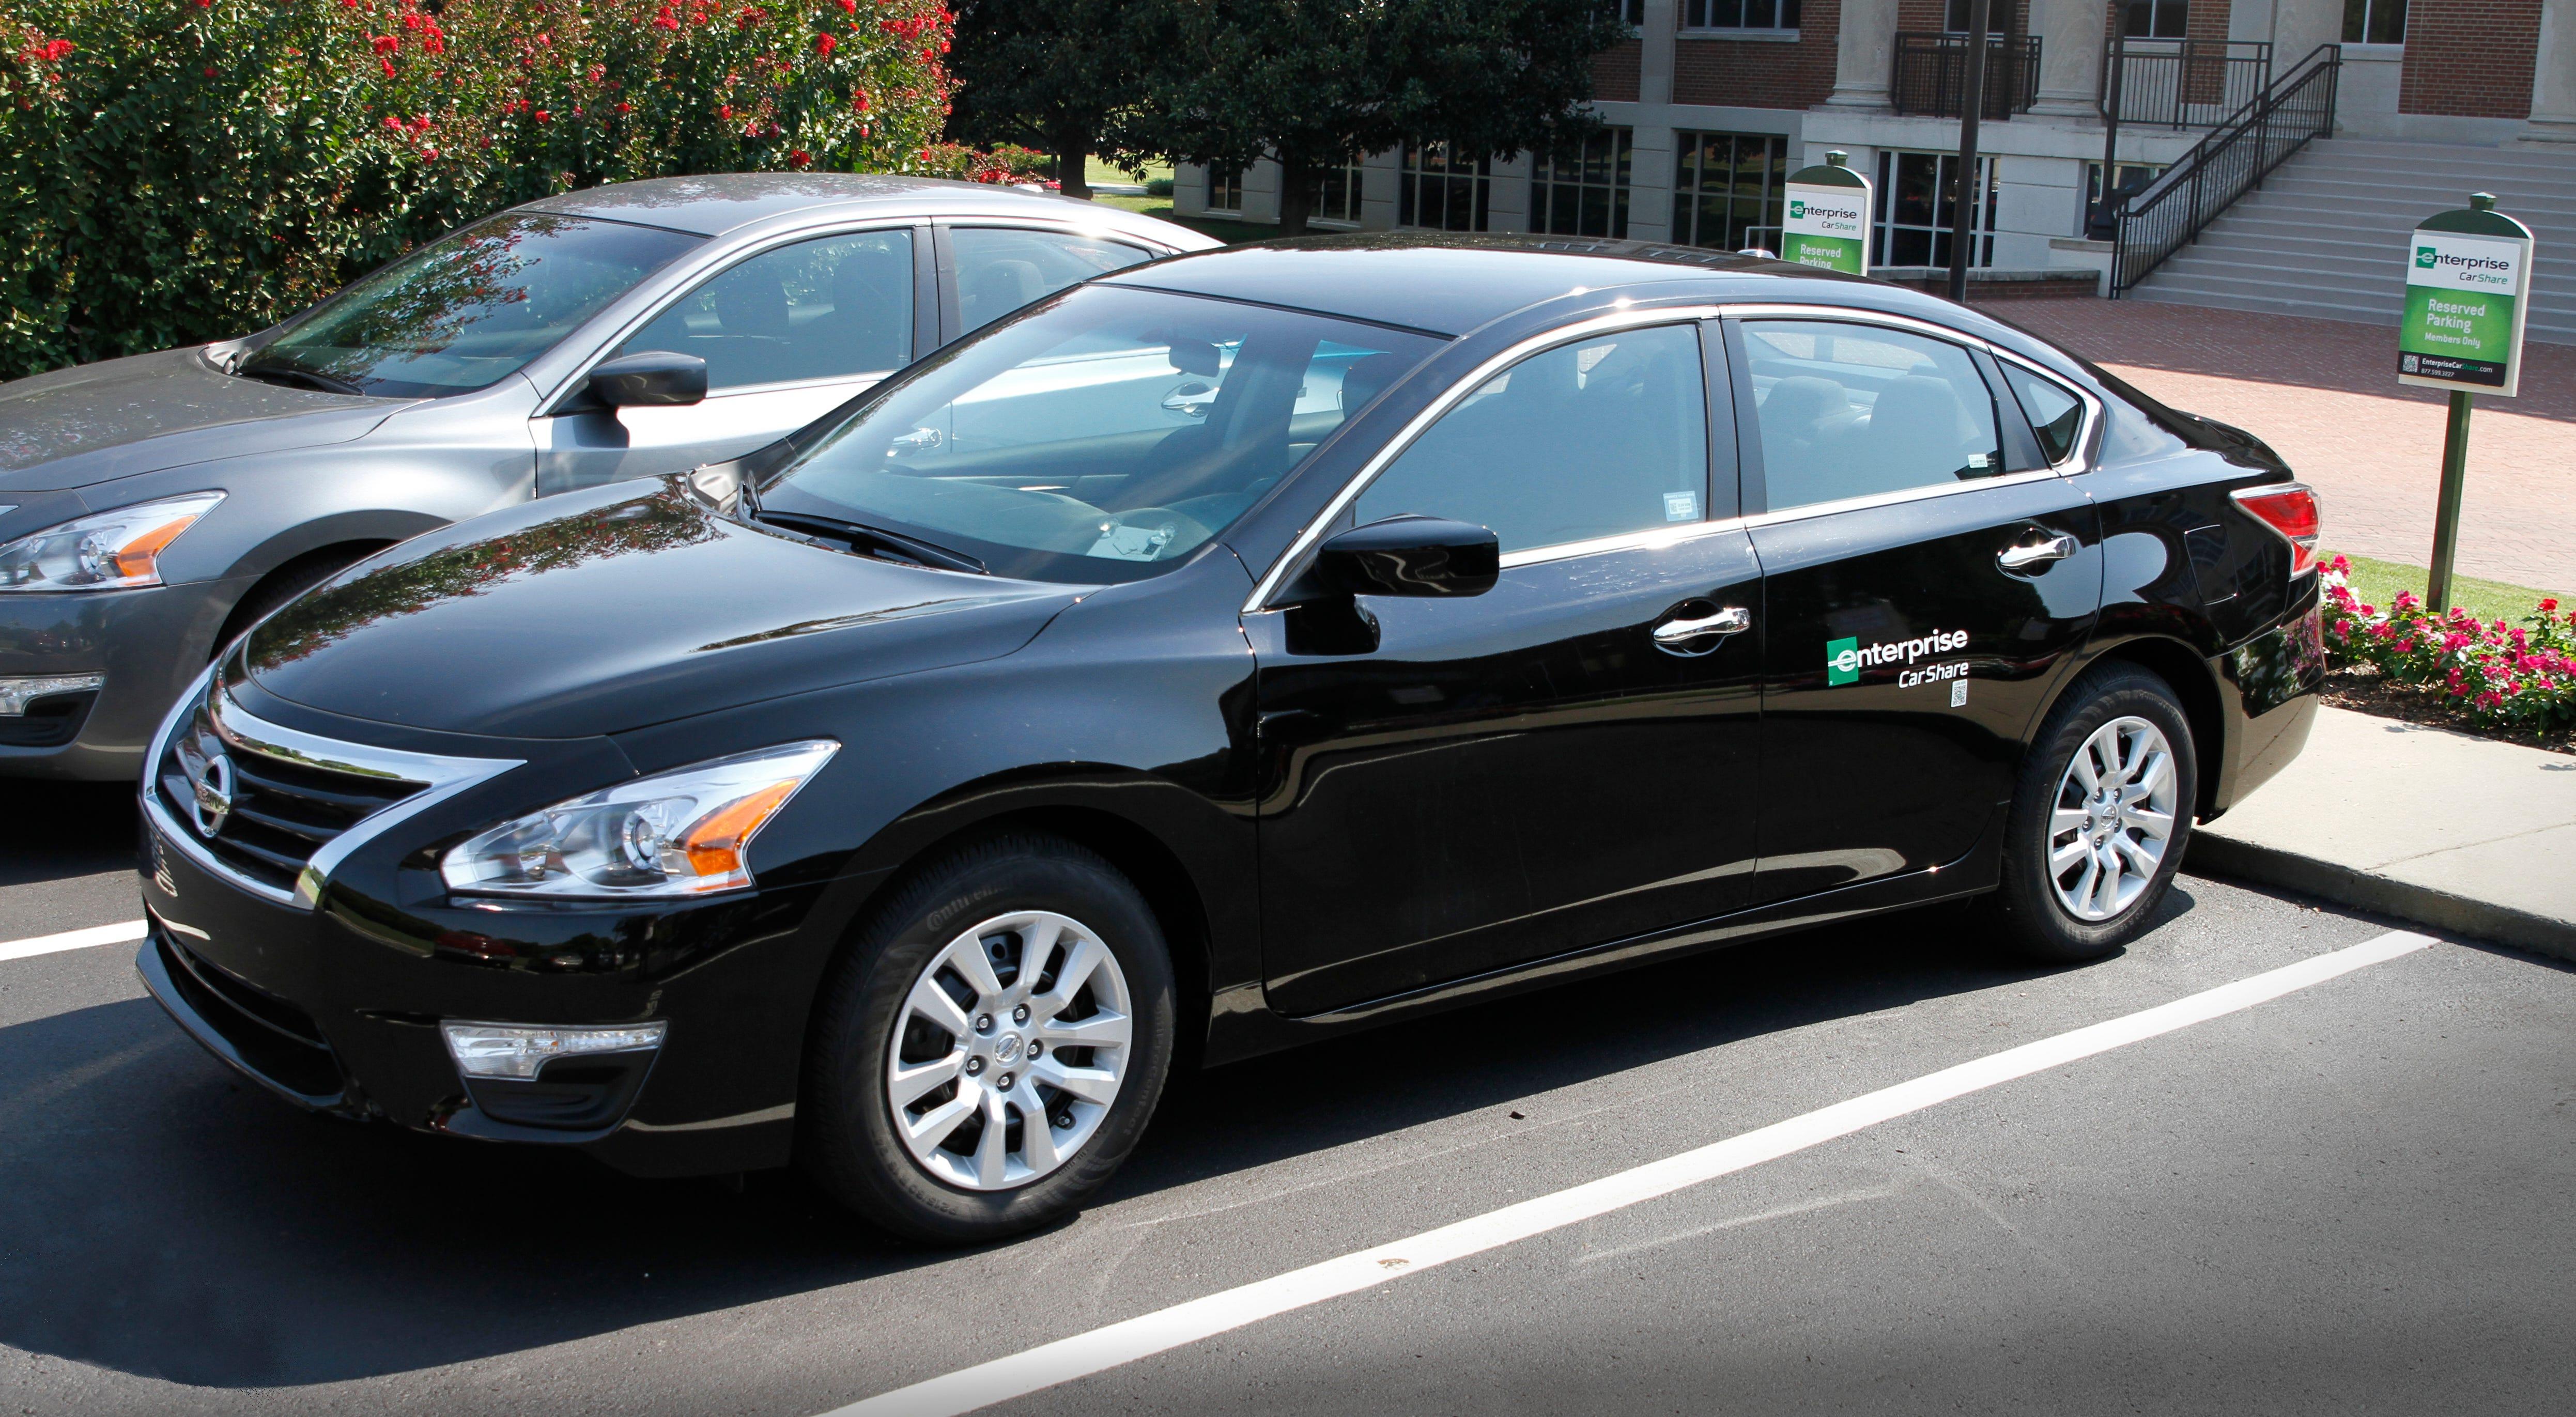 Enterprise Car Rental Courtesy Nissan